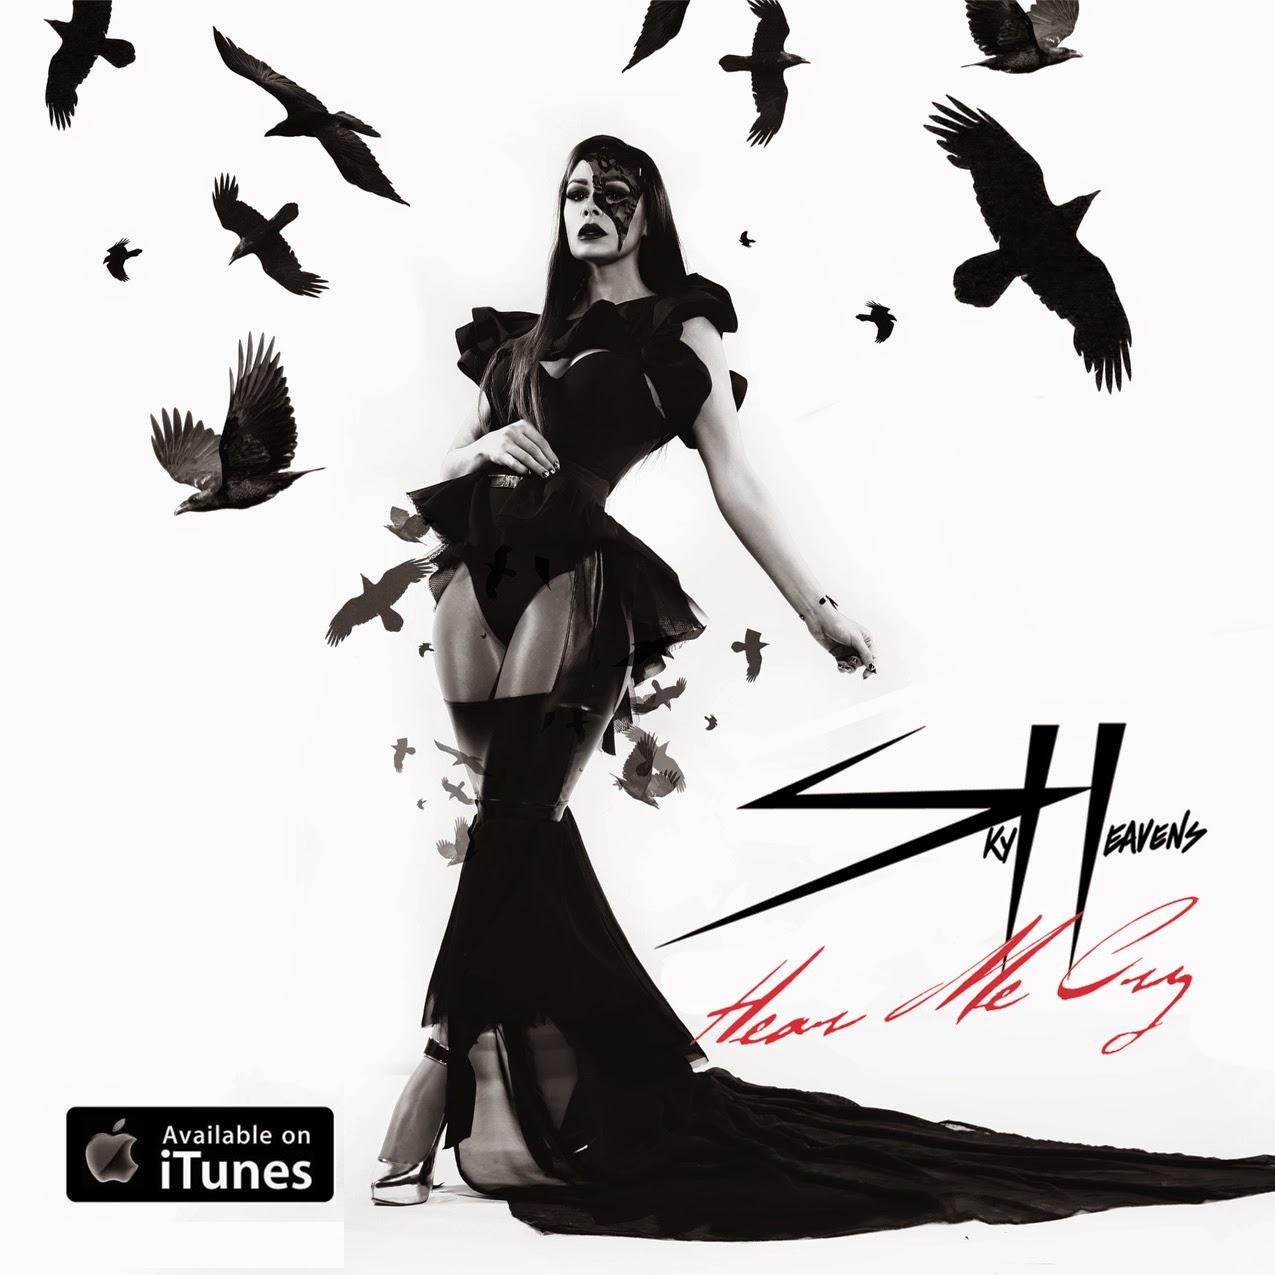 Sky Heavens new single Hear Me Cry